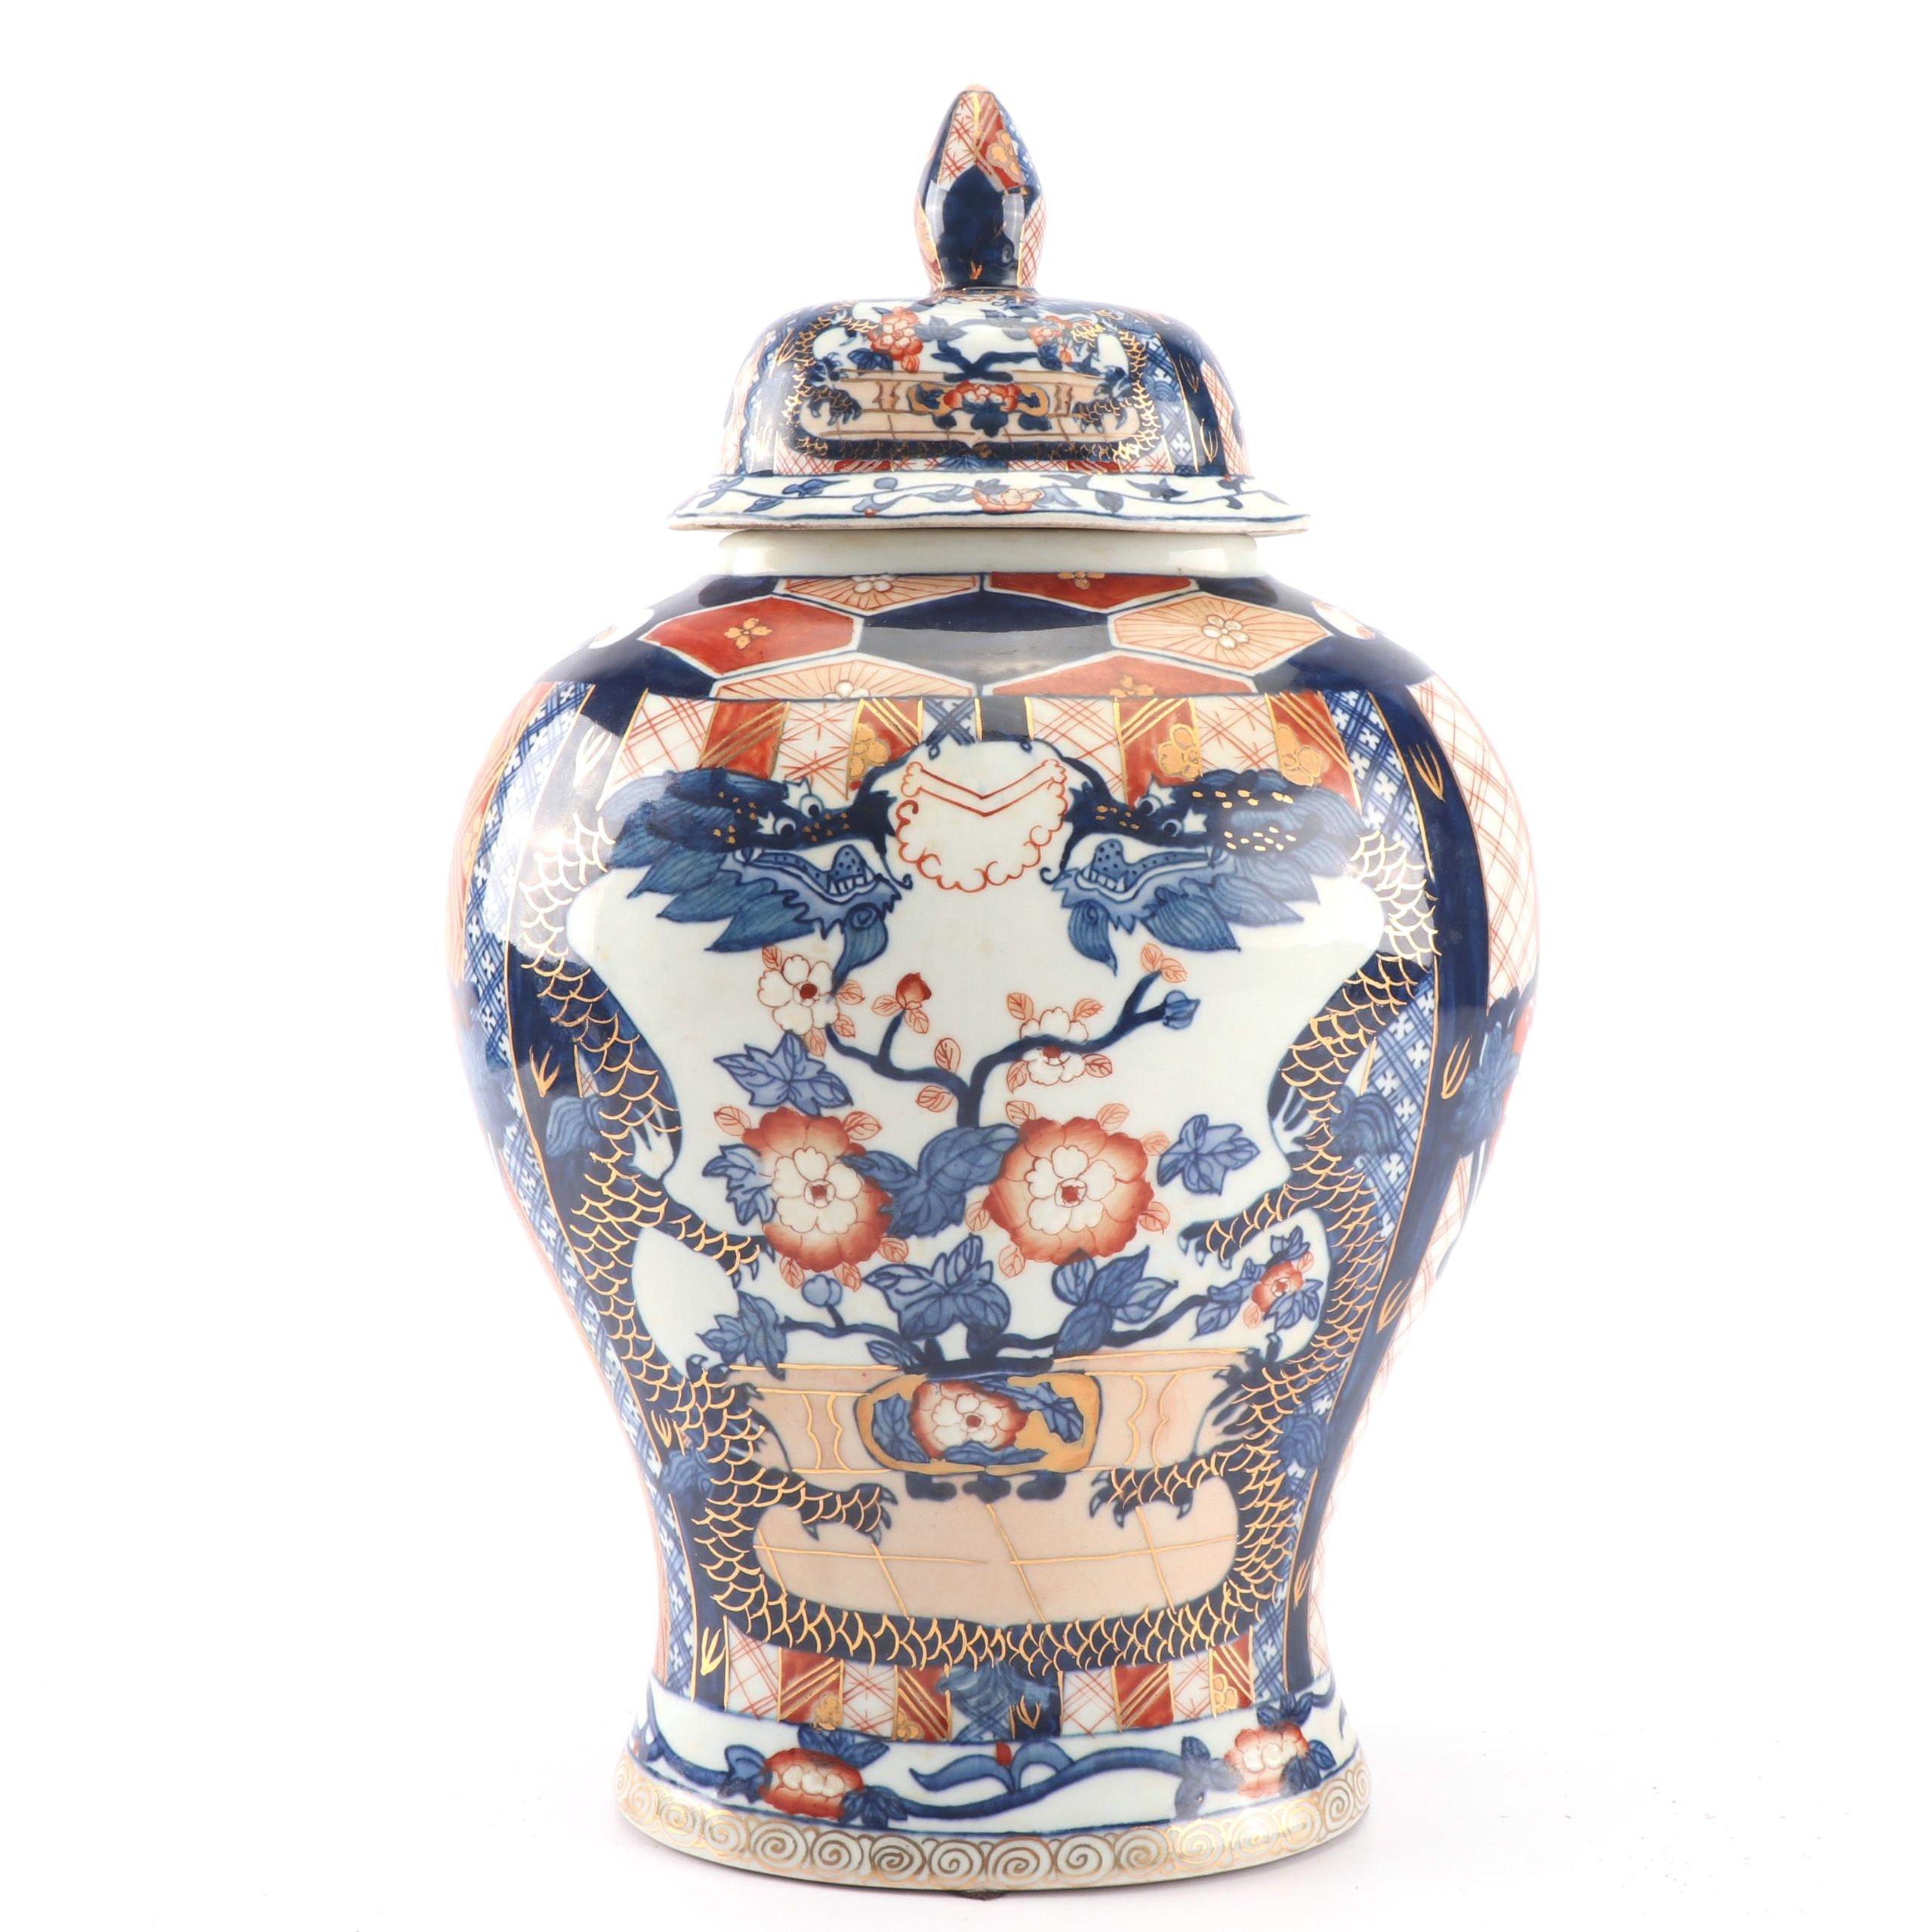 Chinese Republic Imari Palette Ceramic Ginger Jar, Circa 1912-1949